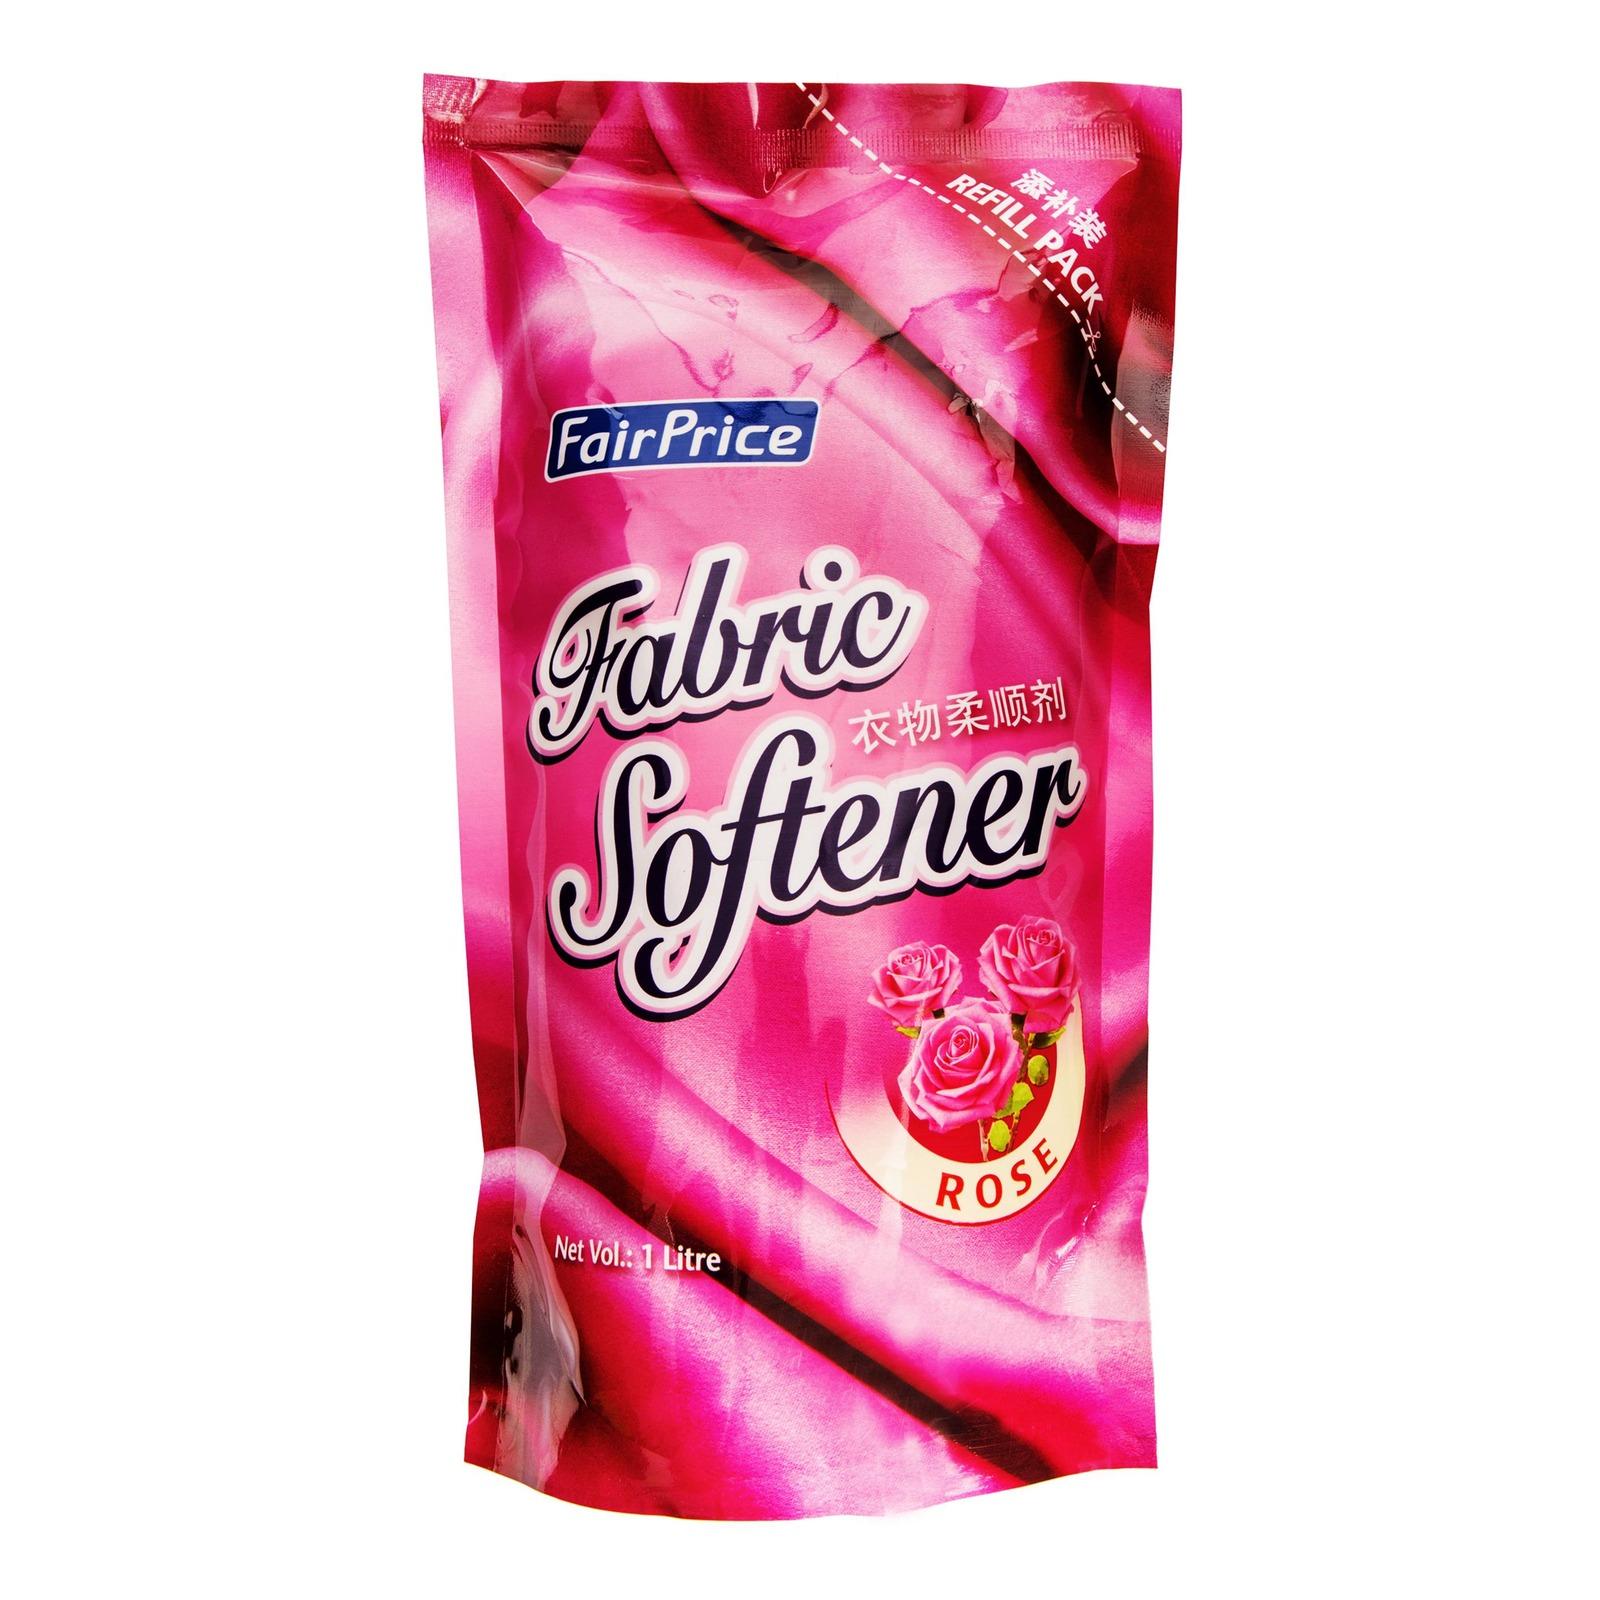 FairPrice Fabric Softener Refill - Rose